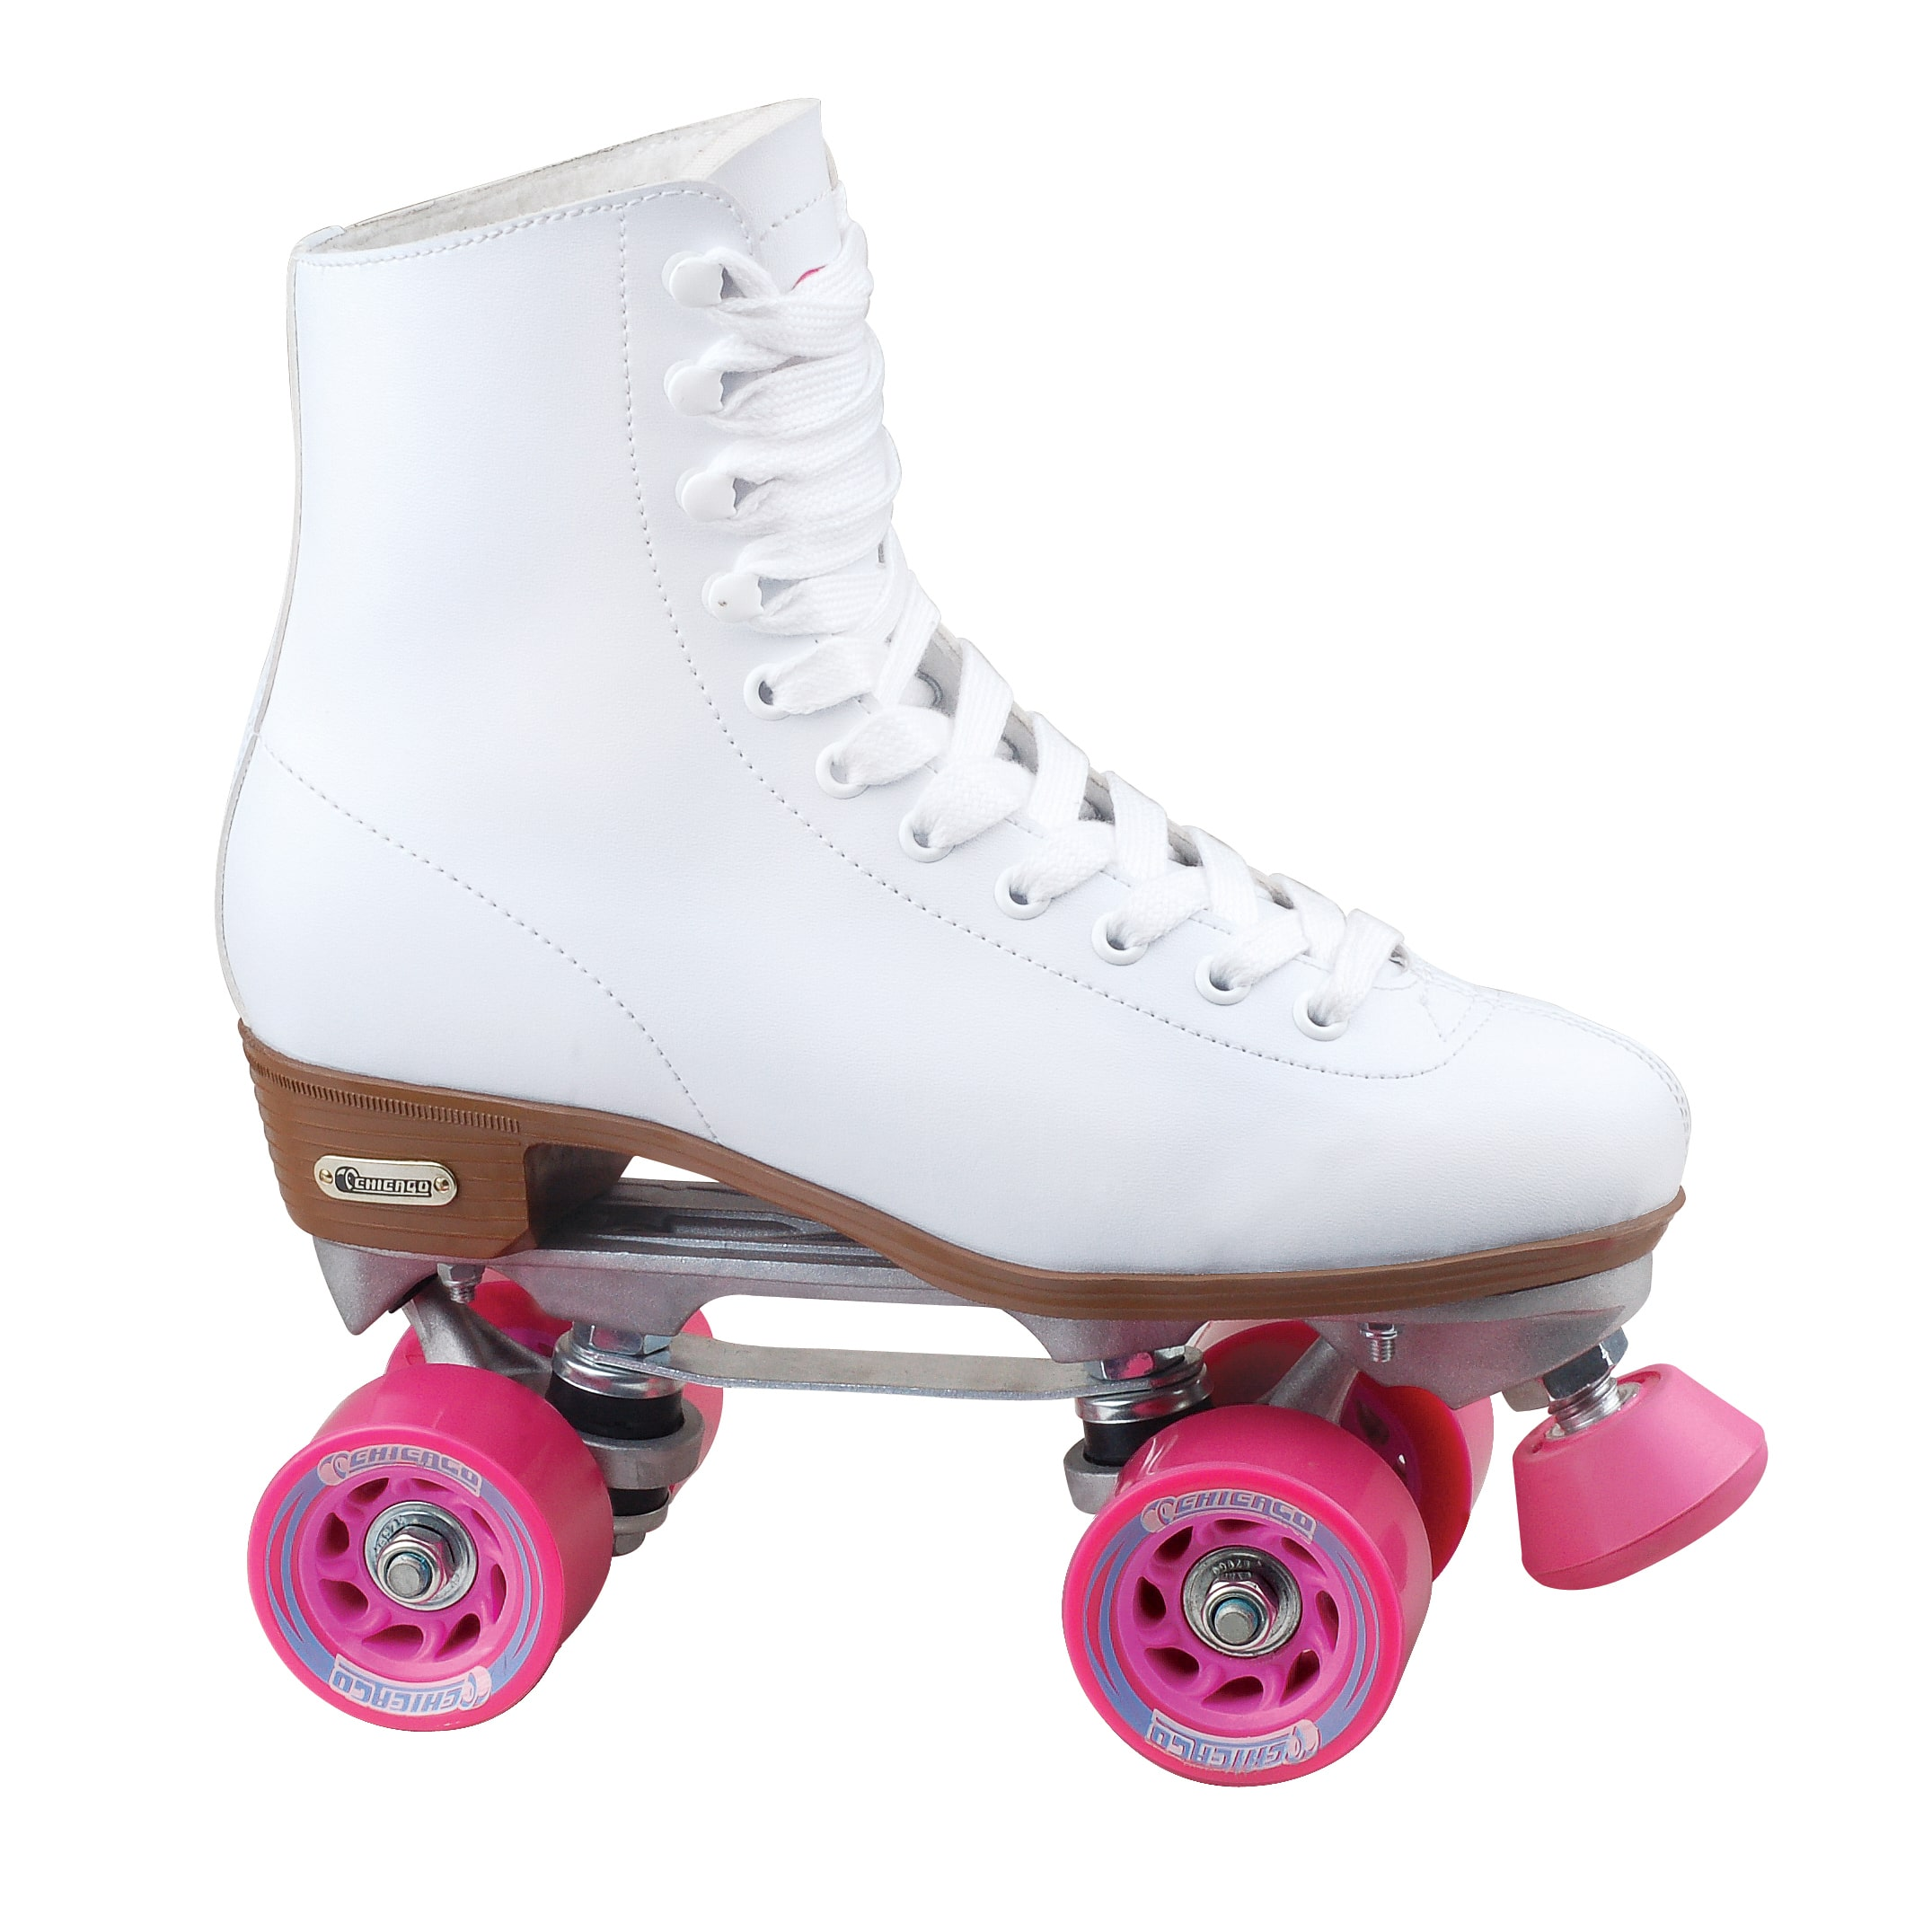 Roller skate shoes walmart - Chicago Ladies Rink Skate